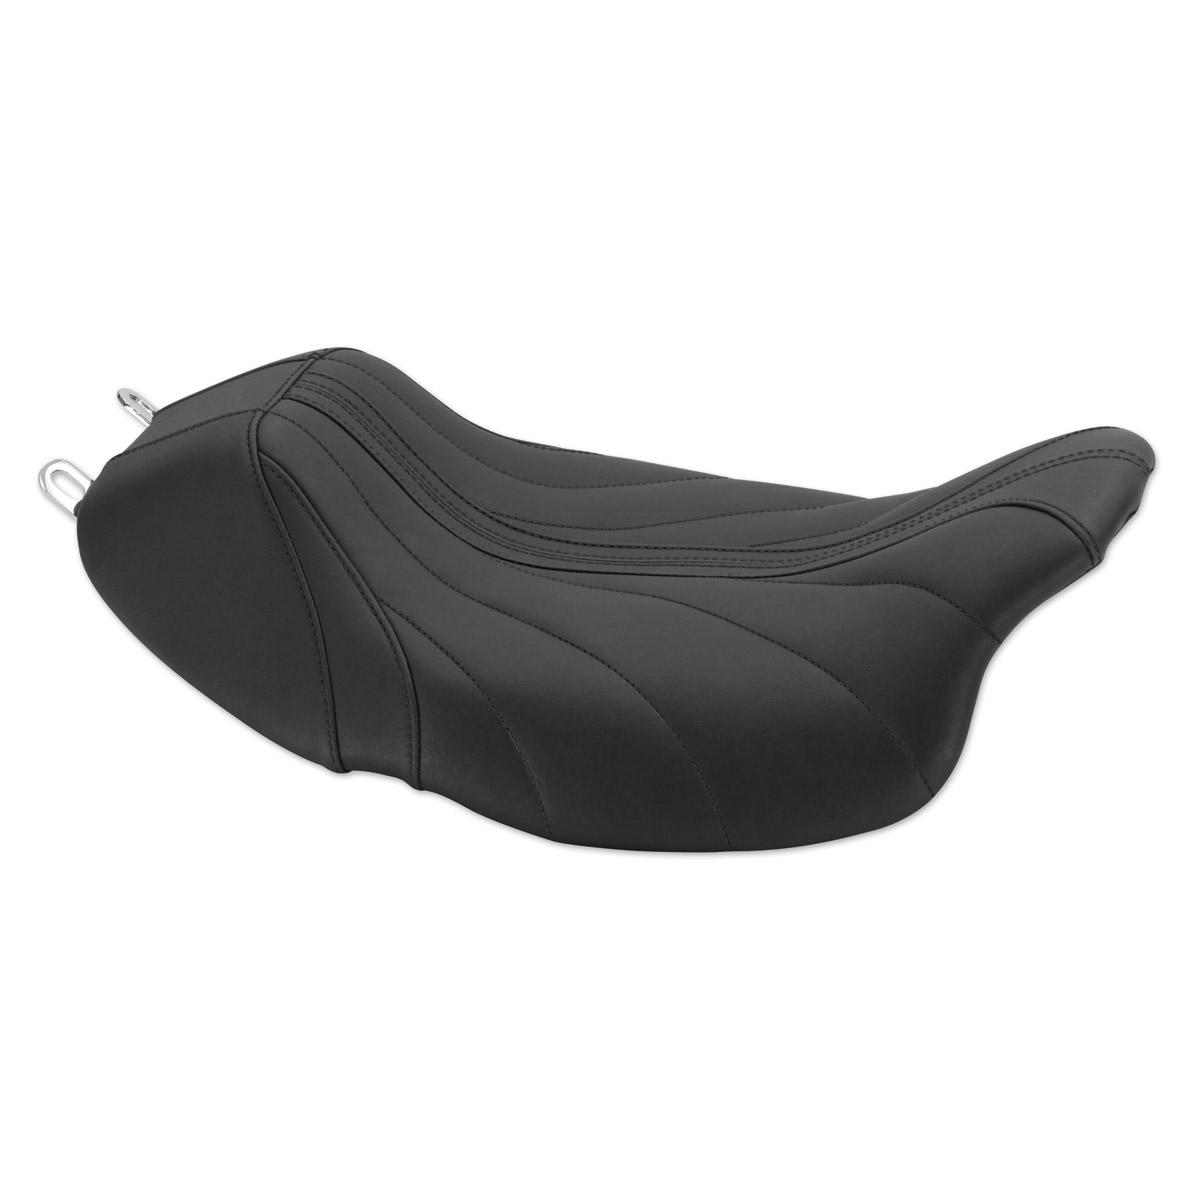 Mustang Revere Journey Gravity Black Thread Seat